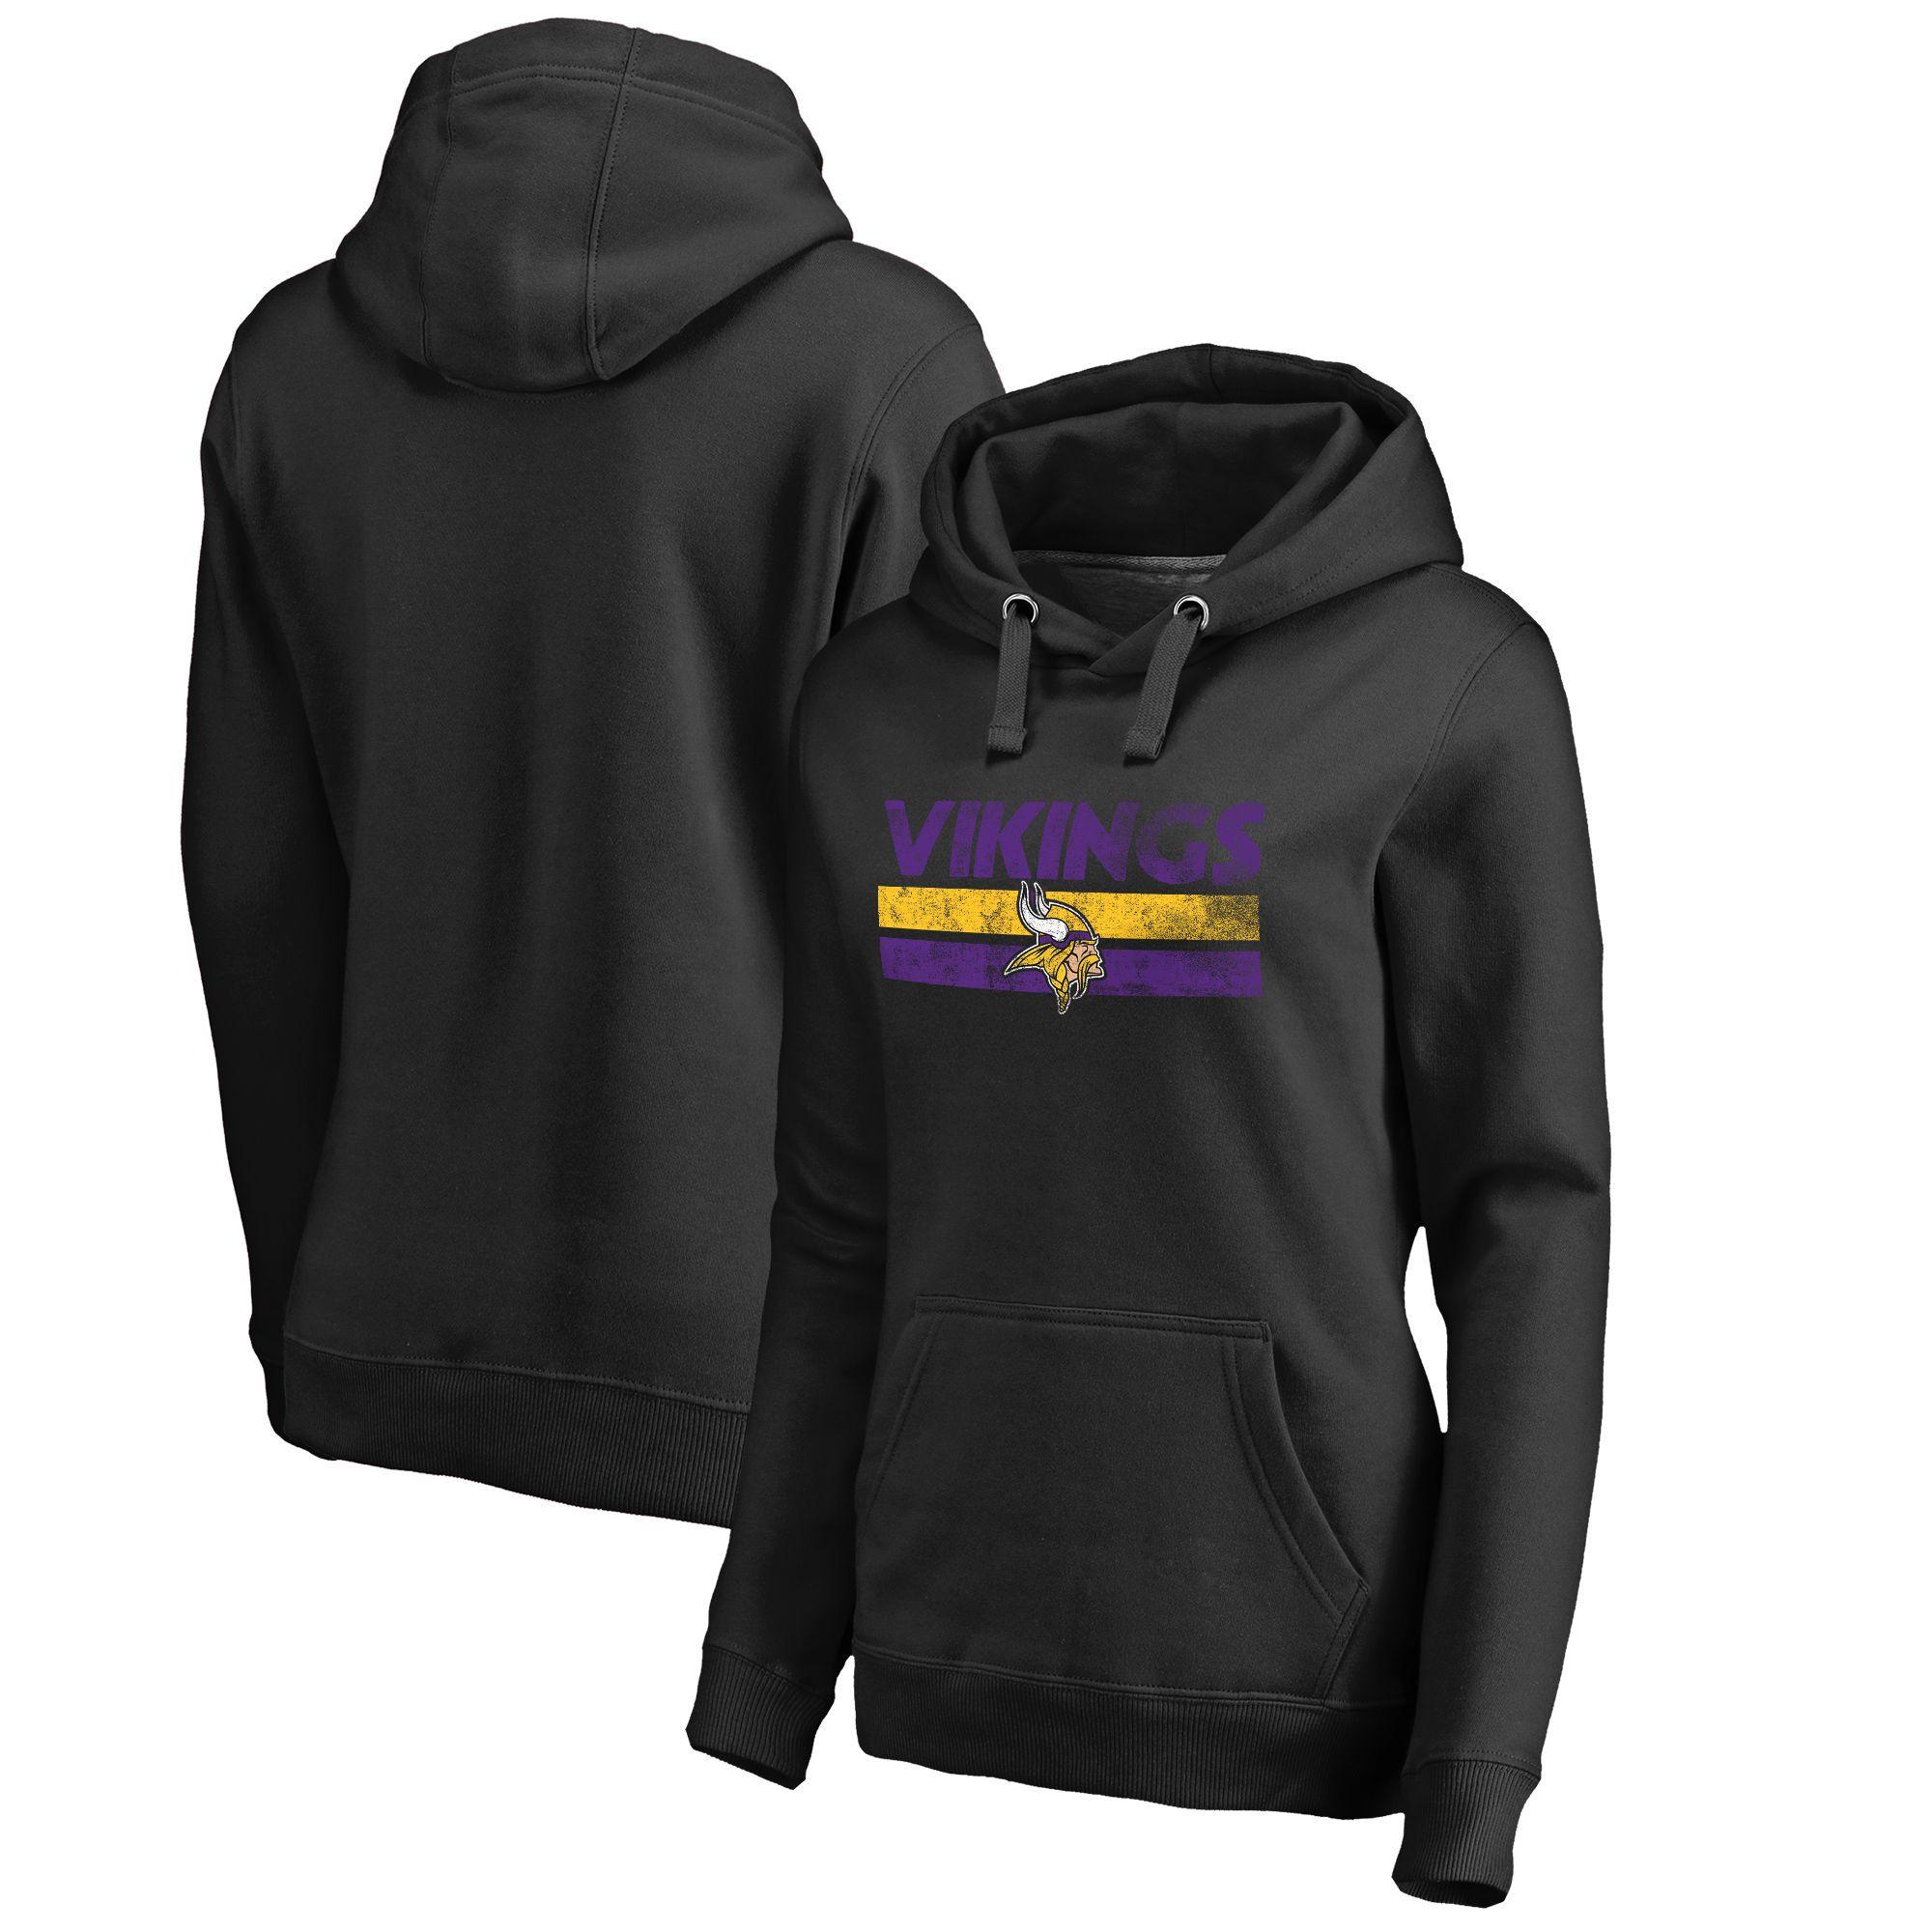 competitive price 7f5fb 88252 NFL Pro Line Minnesota Vikings Women's Black First String ...